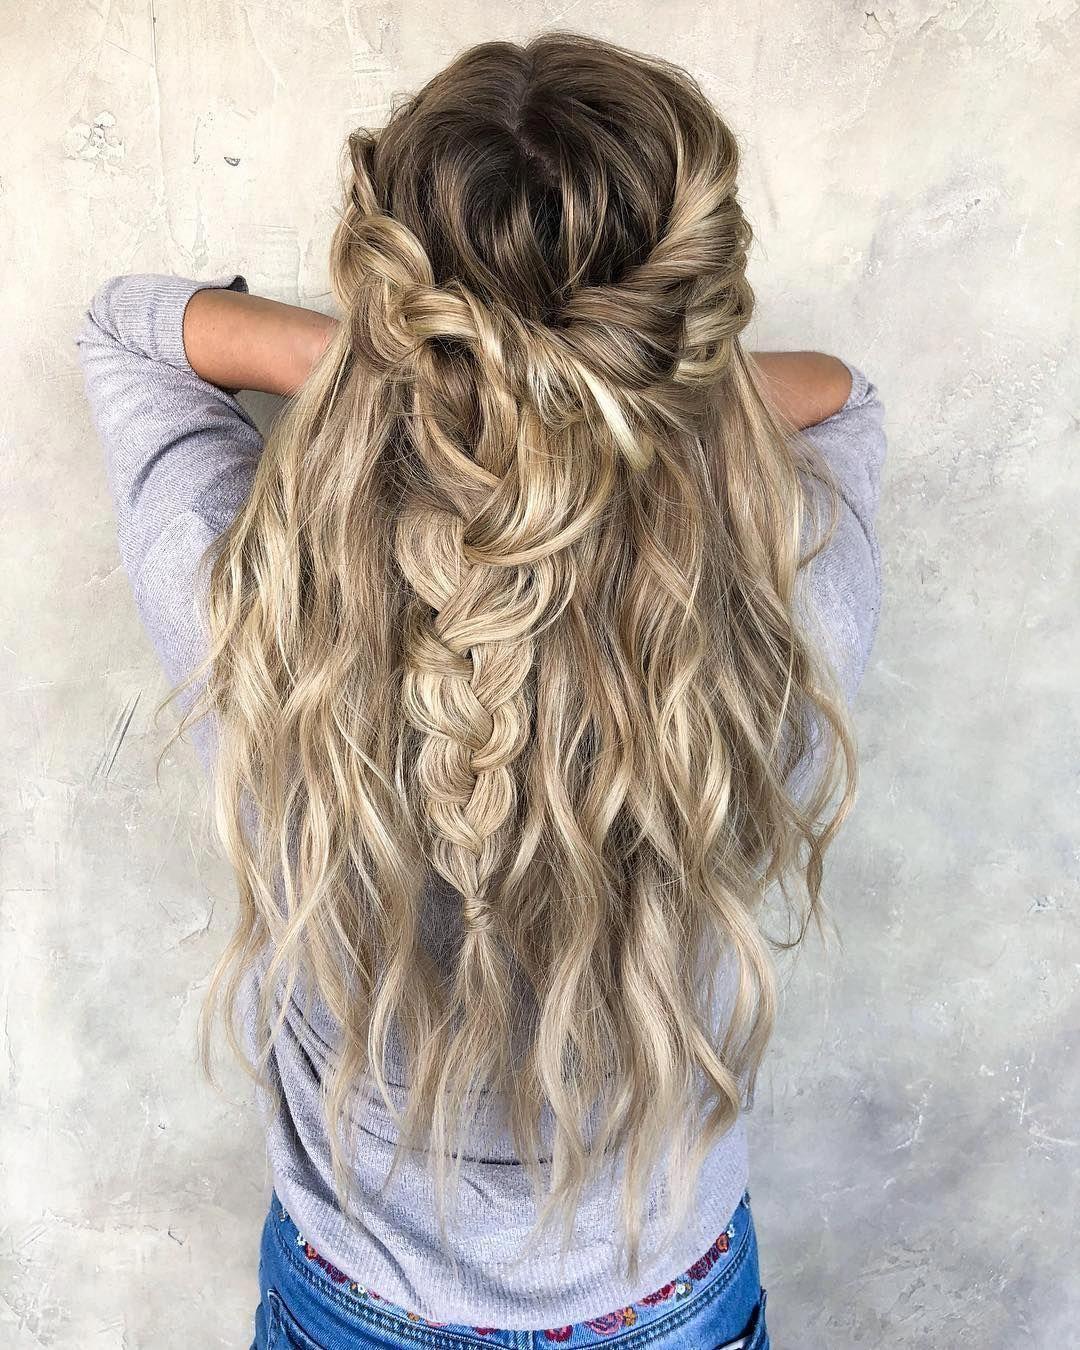 49 Boho Braid Hairstyles To Try Blonde Hair Braid Half Up Half Down Hairstyle Braids Hairstyle Boho Braided Hairstyles Half Up Hair Cool Braid Hairstyles